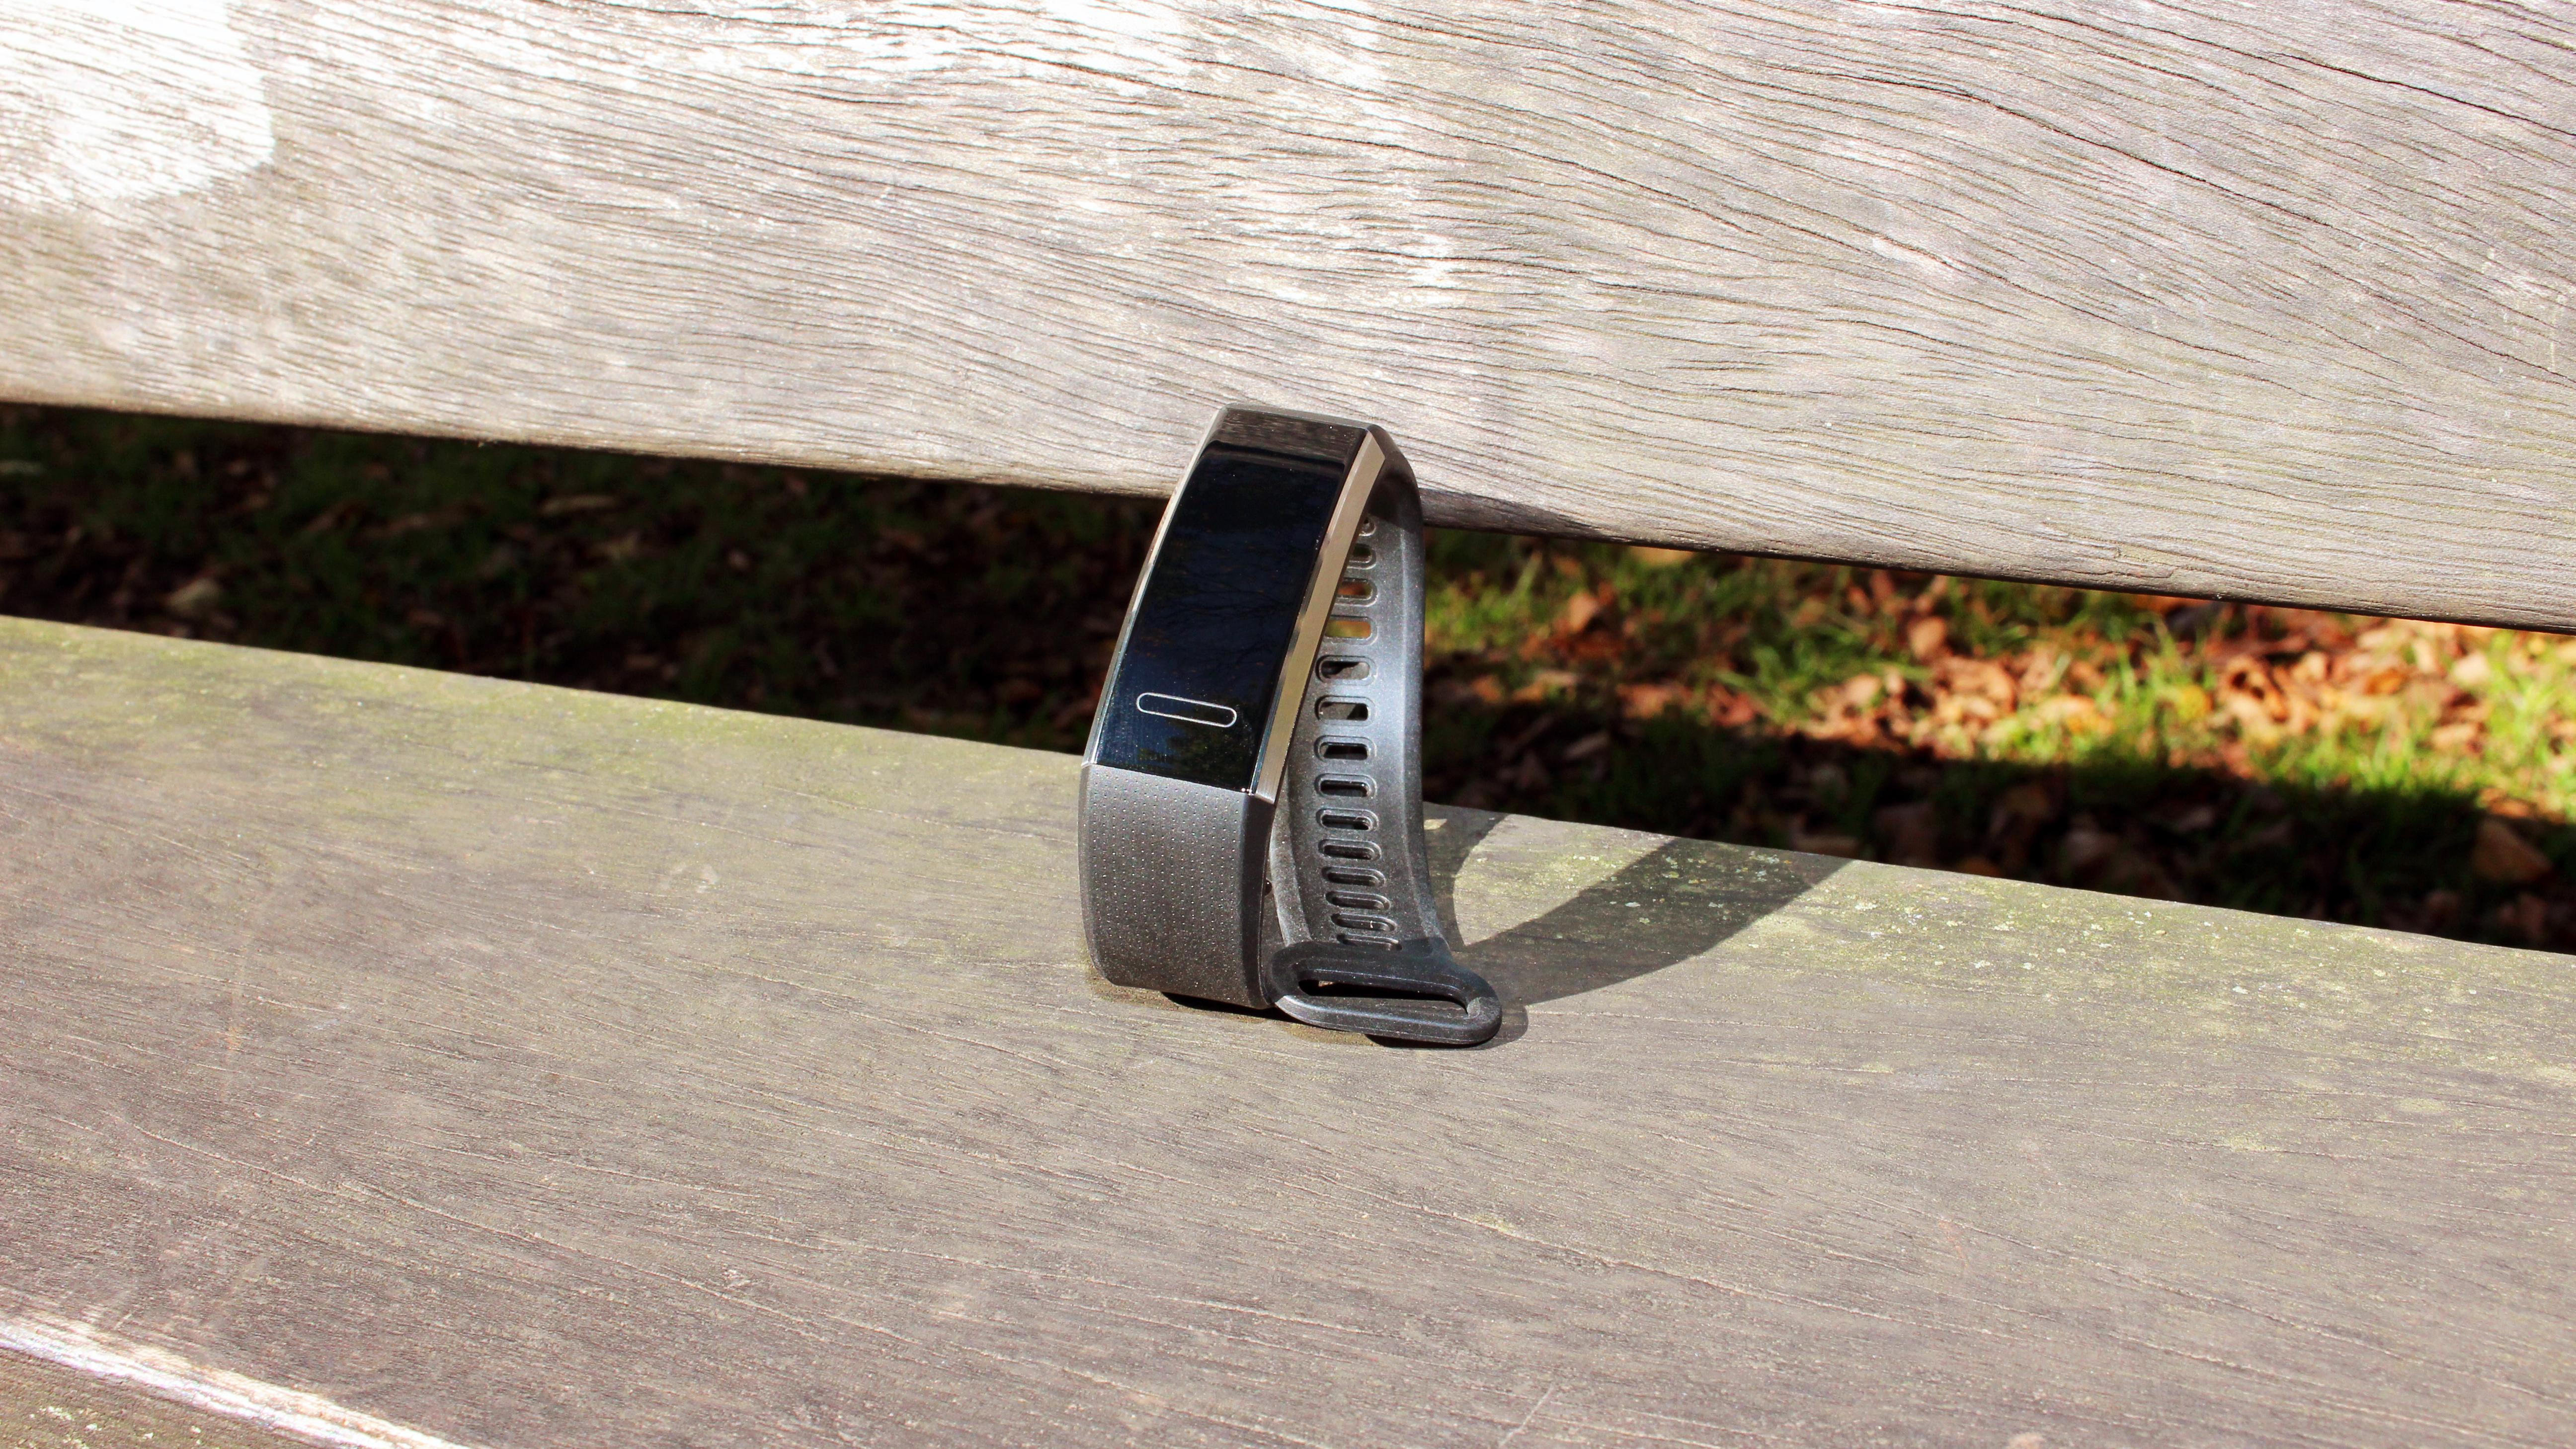 Huawei Band 2 Pro Review Techradar Smart Watch Stainless Steel Mesh Us Warranty